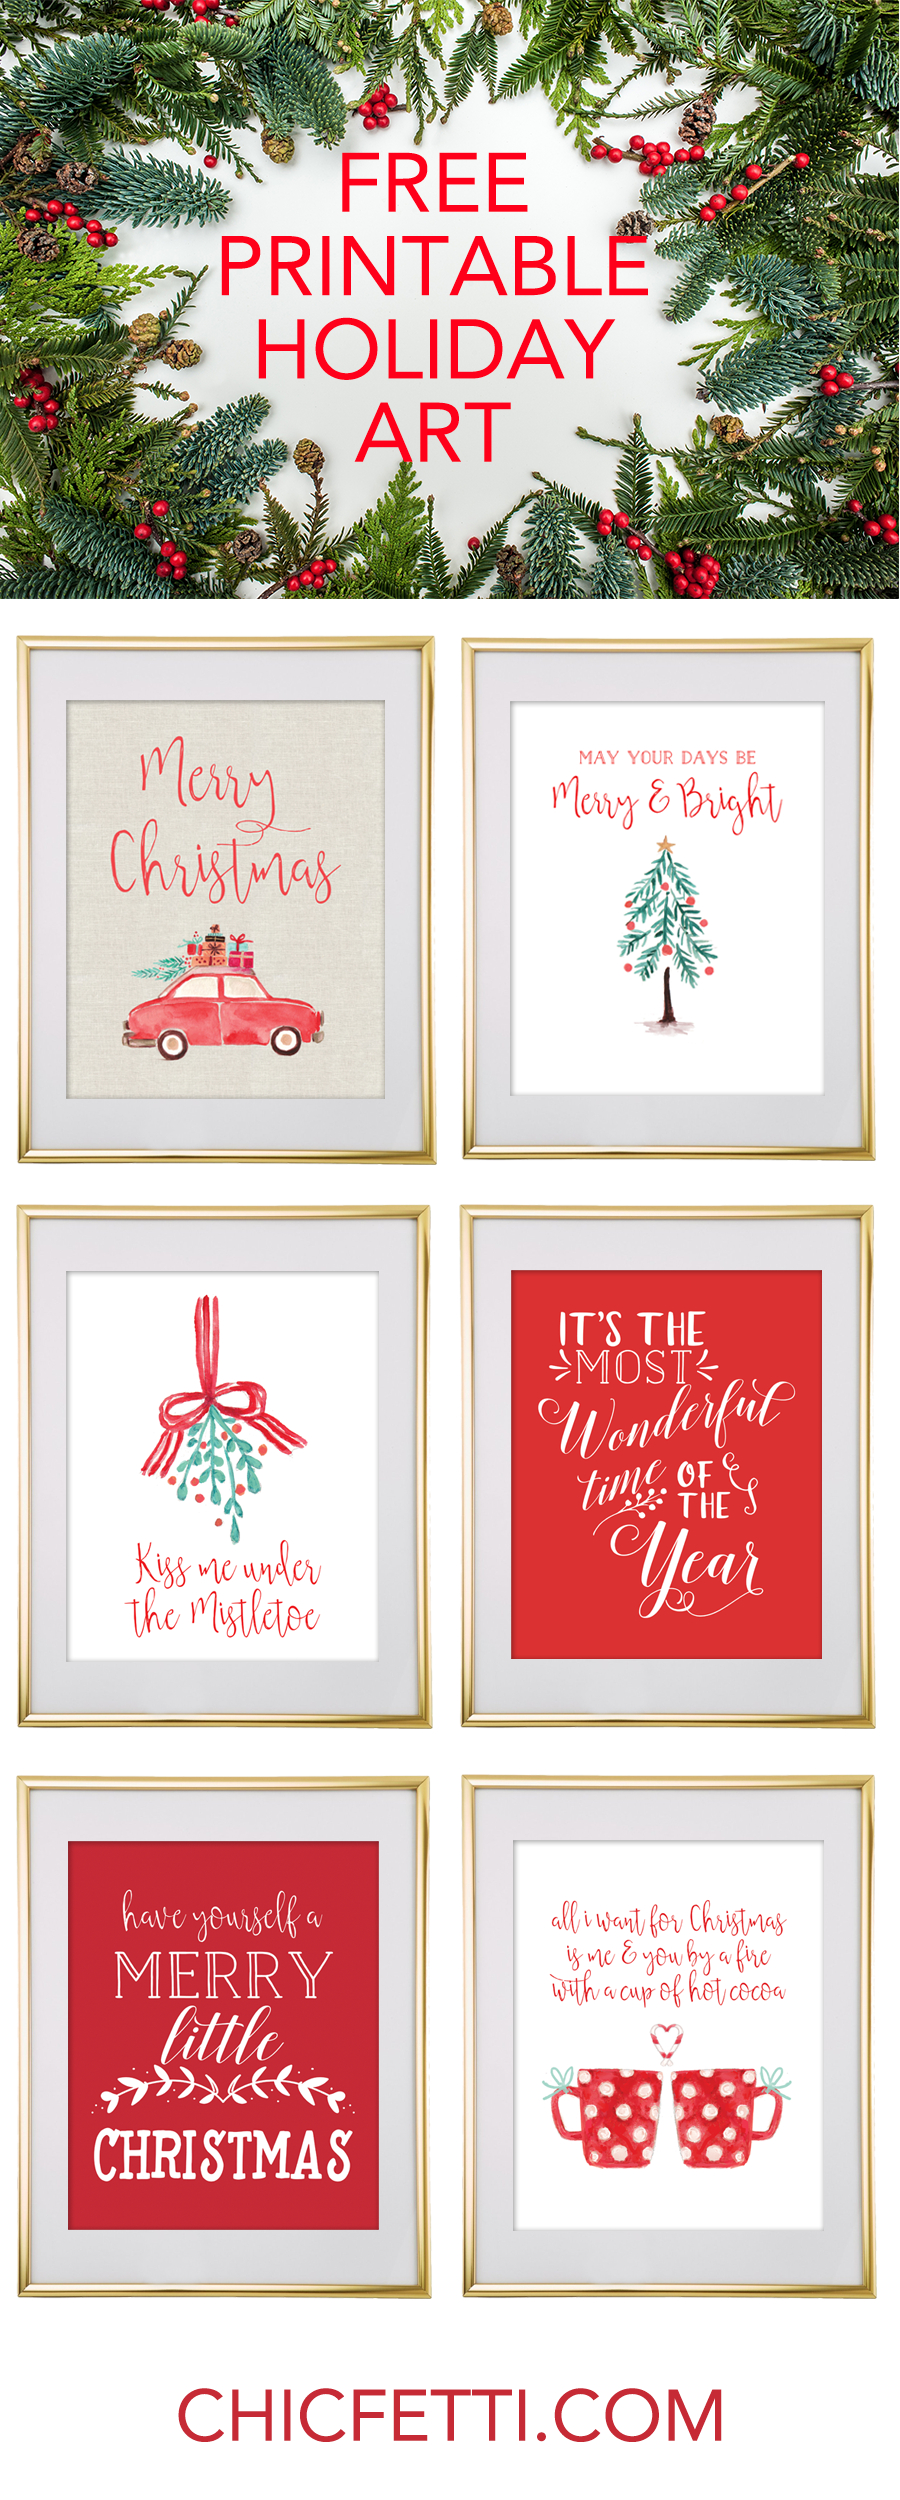 Free Printable Holiday Christmas Wall Art From @chicfetti   Free - Free Printable Christmas Art